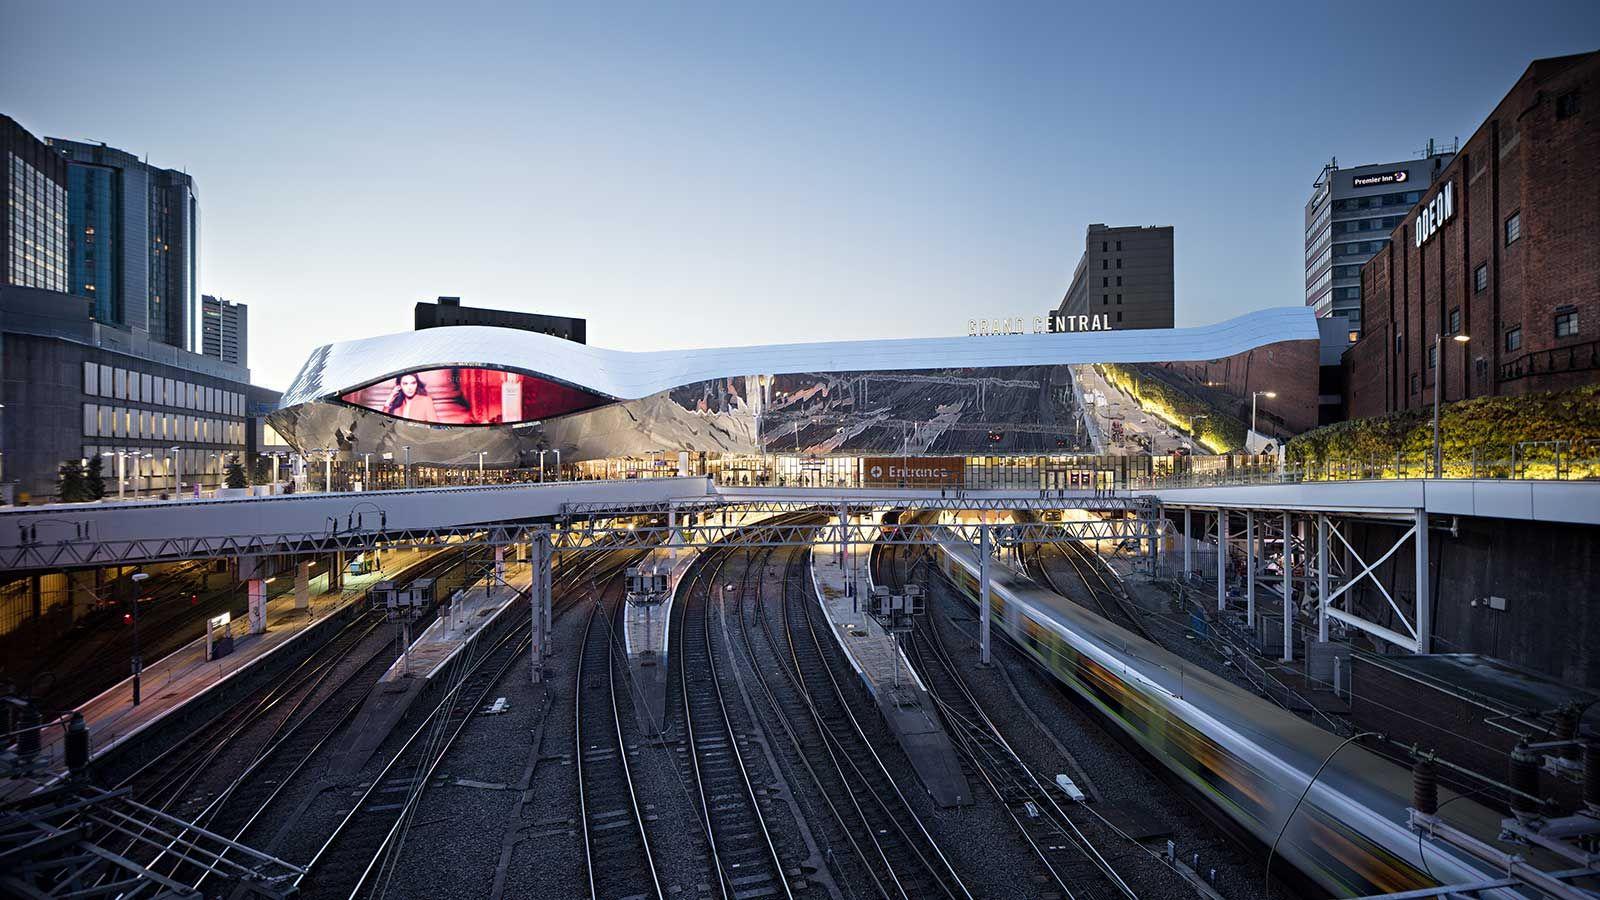 Birmingham New Street Station Railway Aerial View - Mace Group